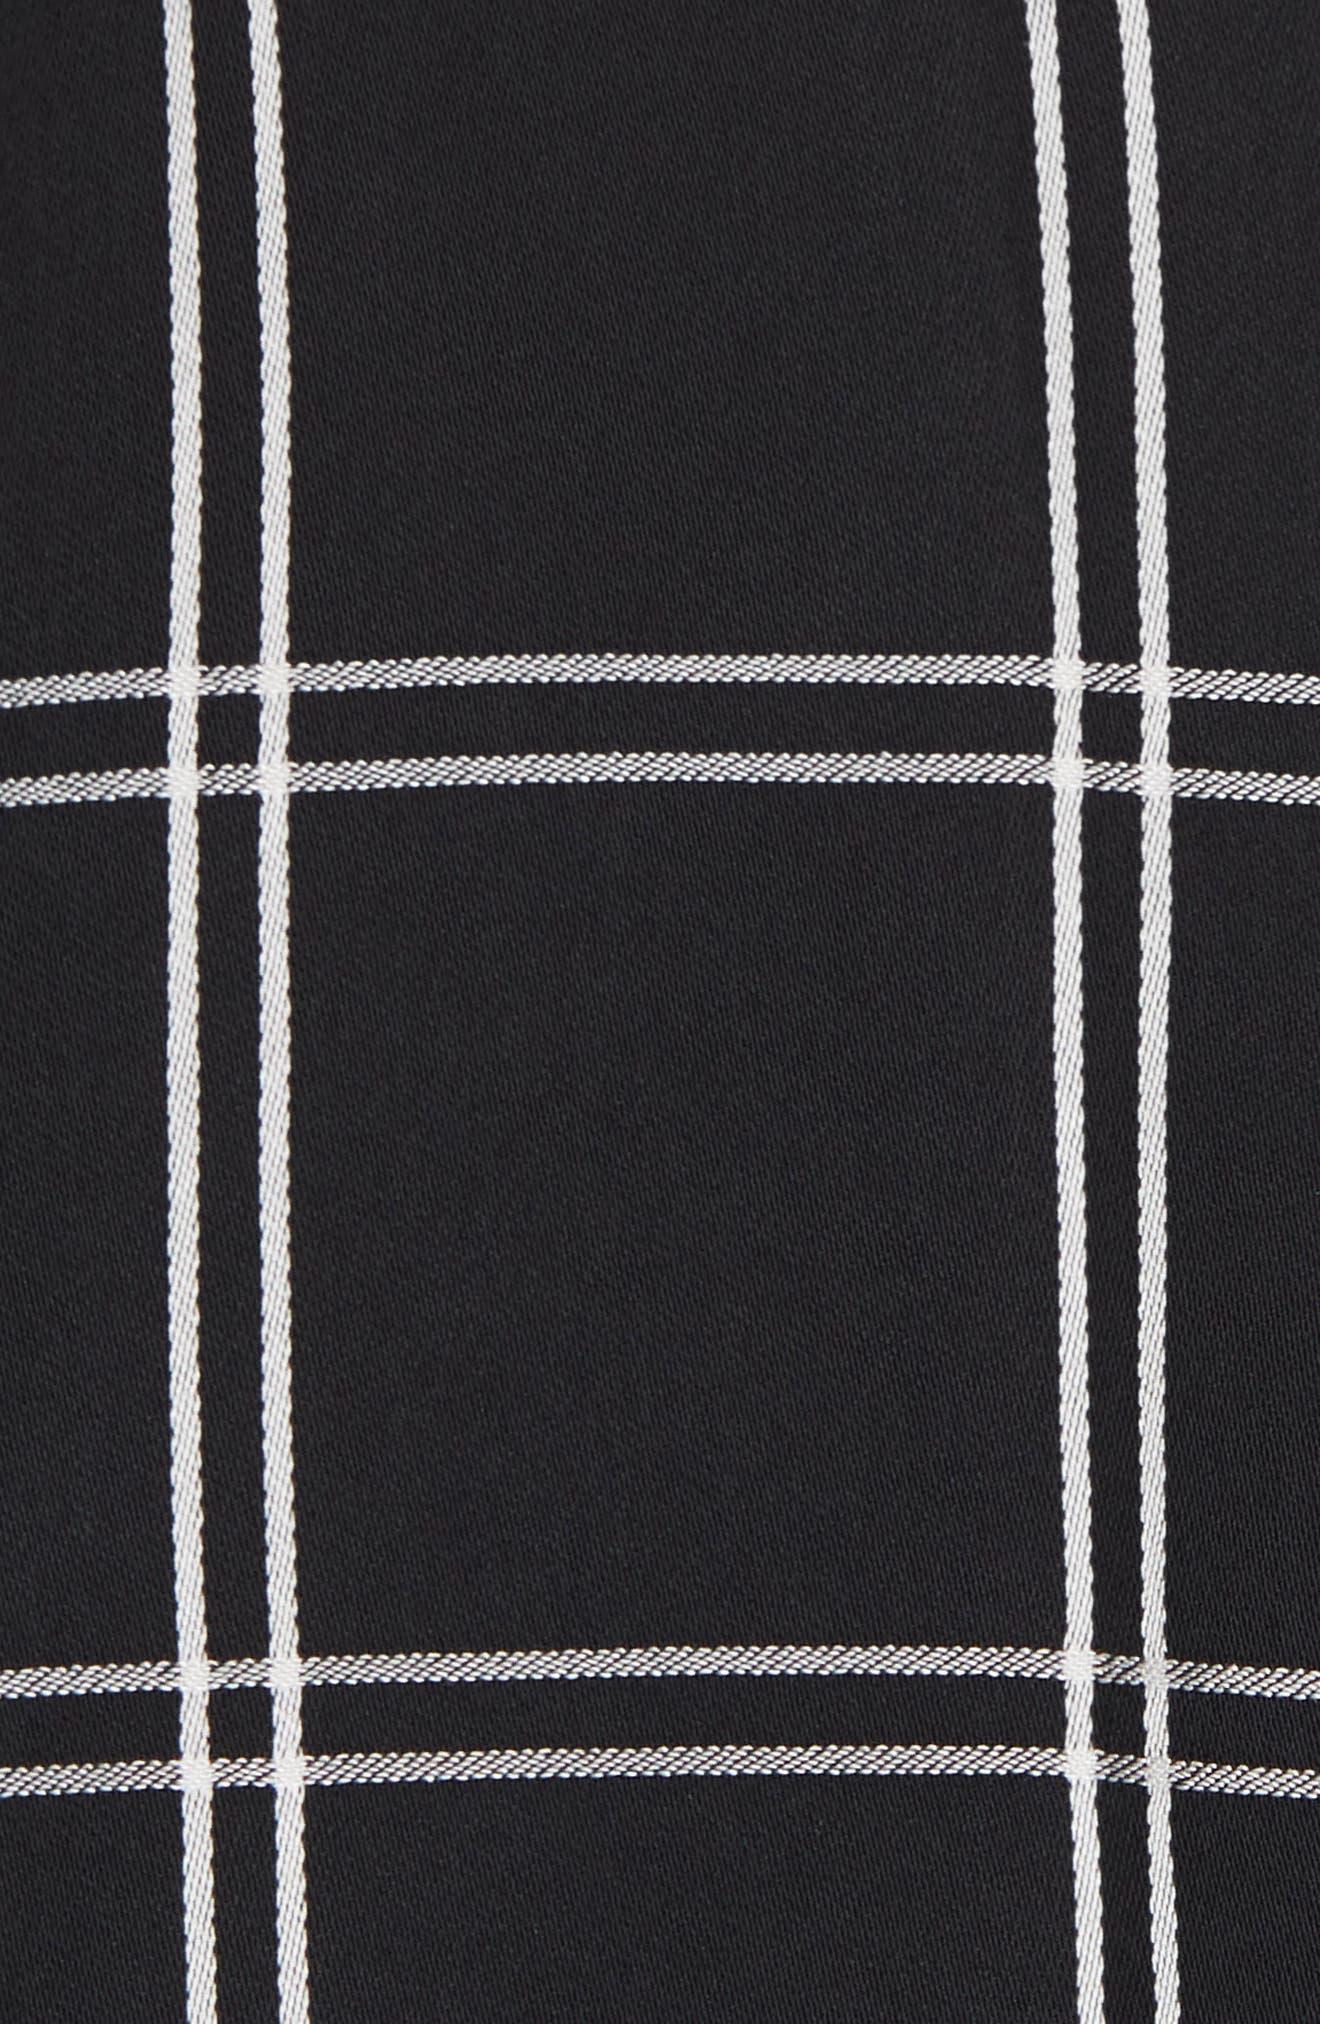 Check Handkerchief Top,                             Alternate thumbnail 5, color,                             001